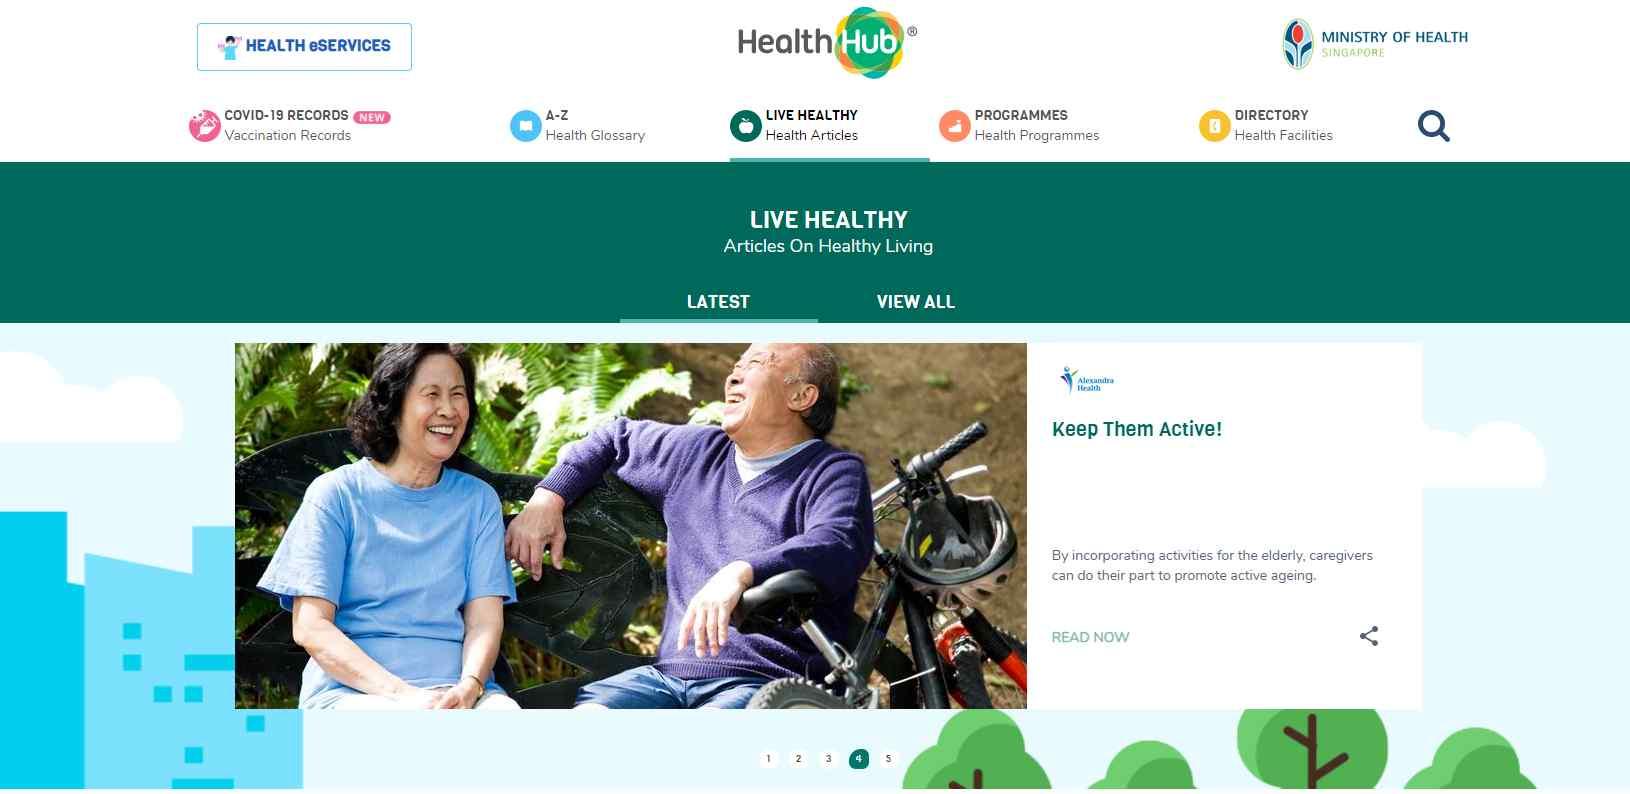 health hub Top Health Blogs in Singapore